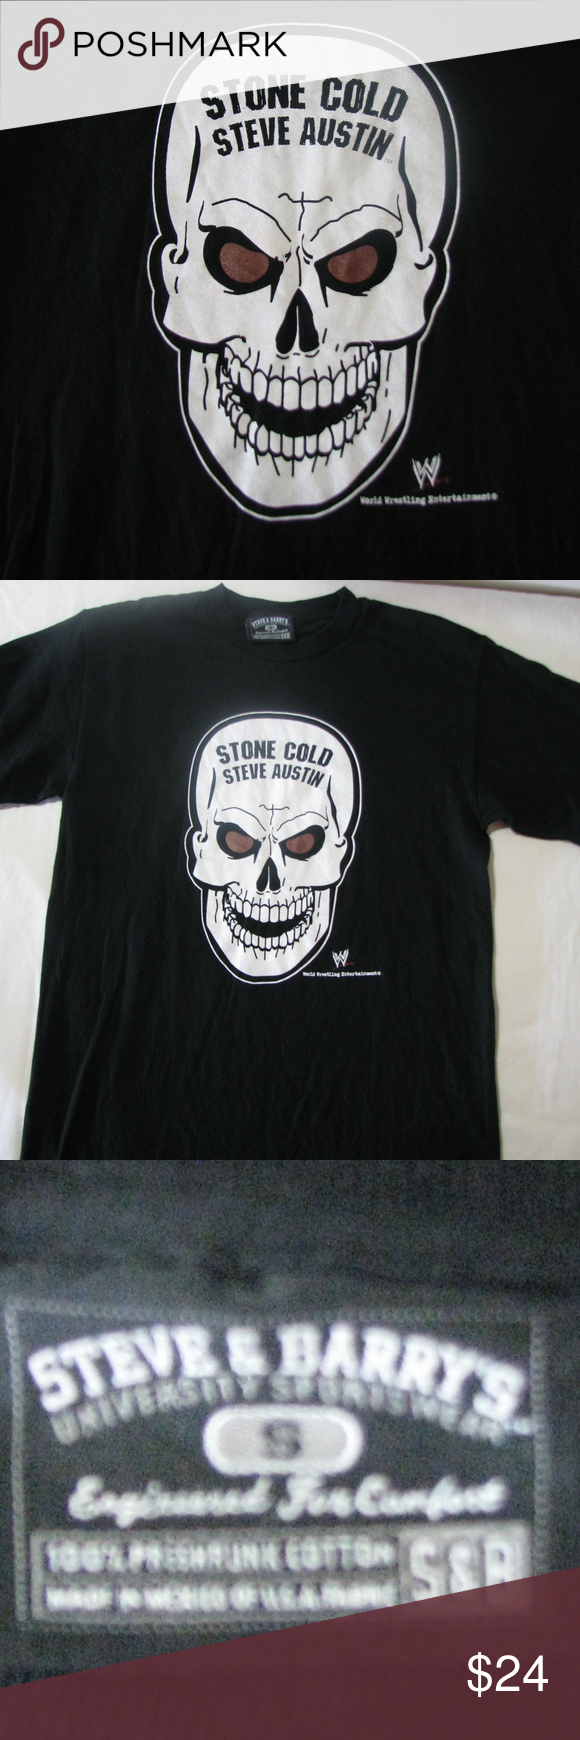 Vintage Stone Cold Steve Austin T Shirt S Vintage 90 S Stone Cold Steve Austin Wwe Skull T Shirt Steve Barry S Siz Steve Austin Stone Cold Steve T Shirt